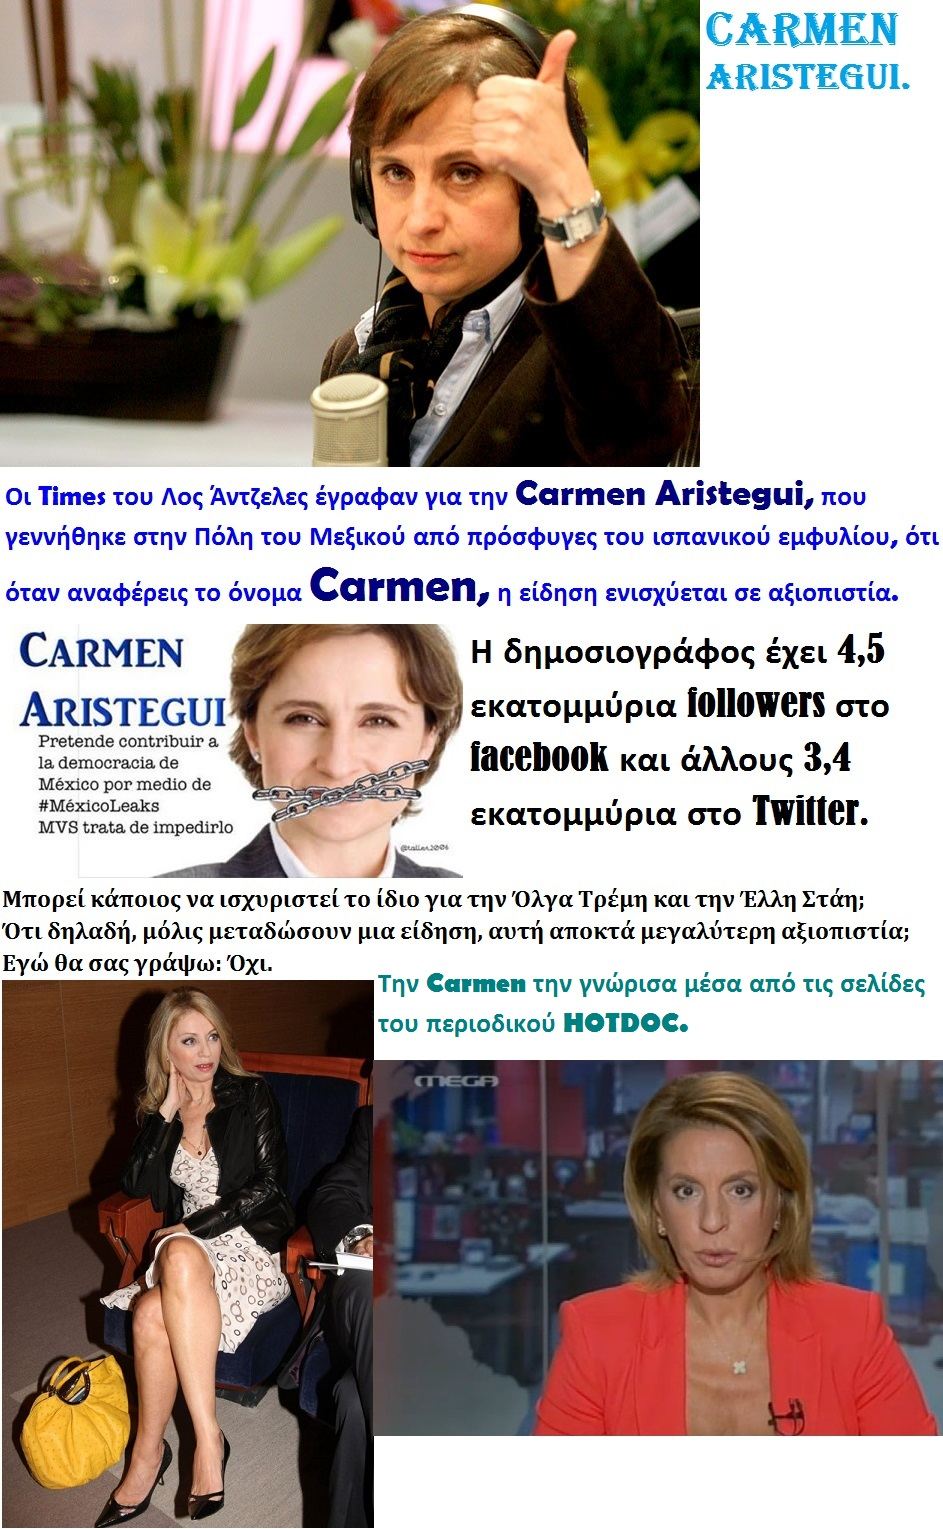 MEXICO CARMEN ARISTEGUI MEXICOLEAKS 03 040515